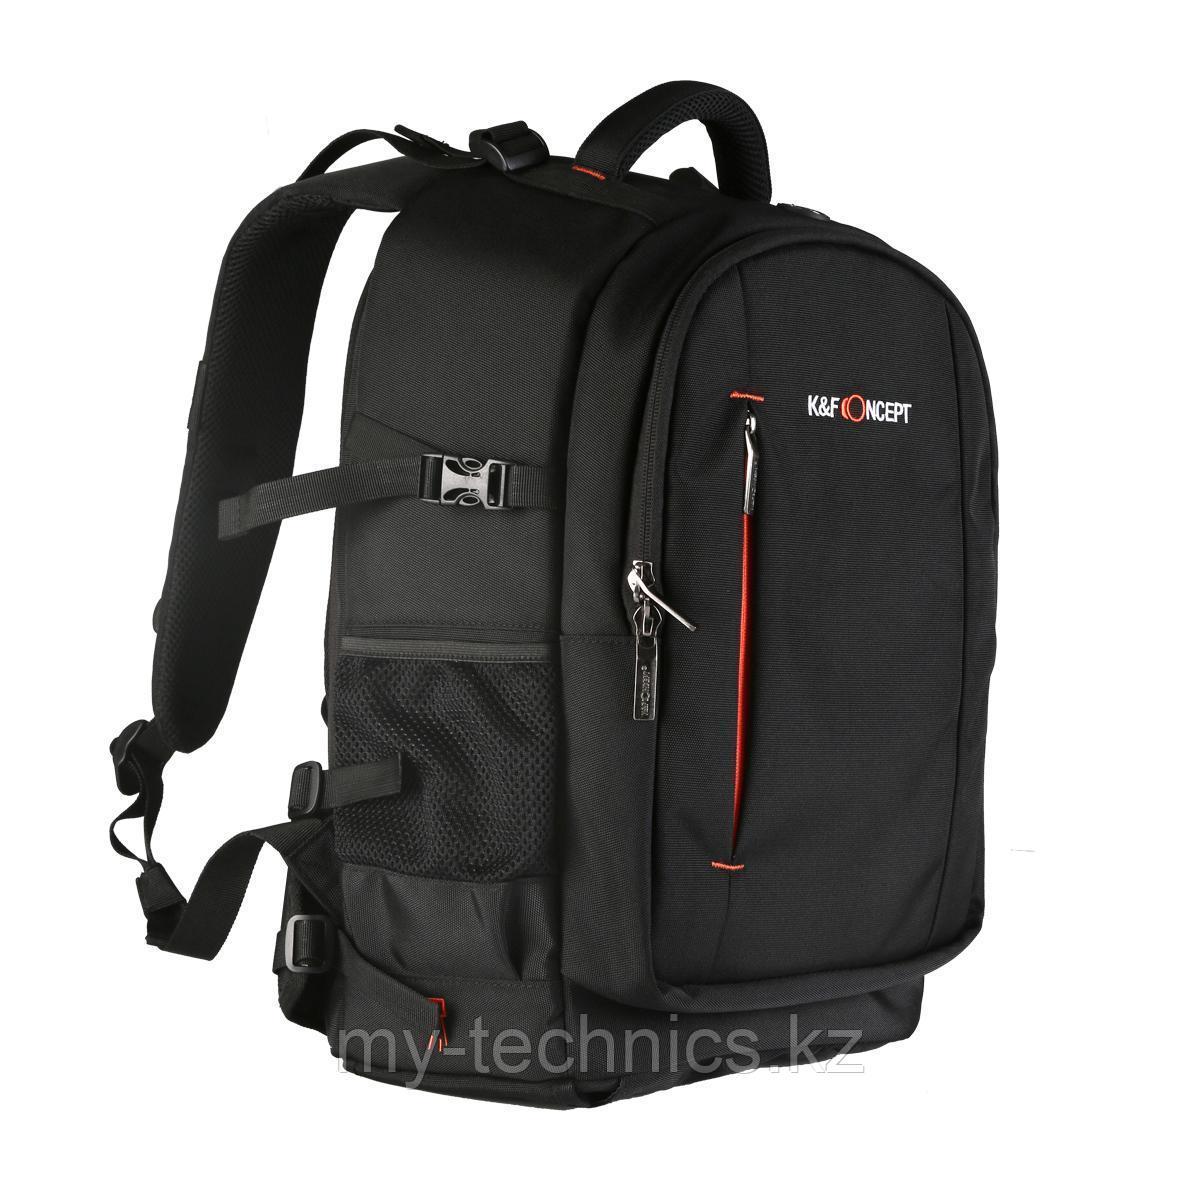 K&F Concept Nylon Multifunctional camera backpack L V5 (KF13.025)